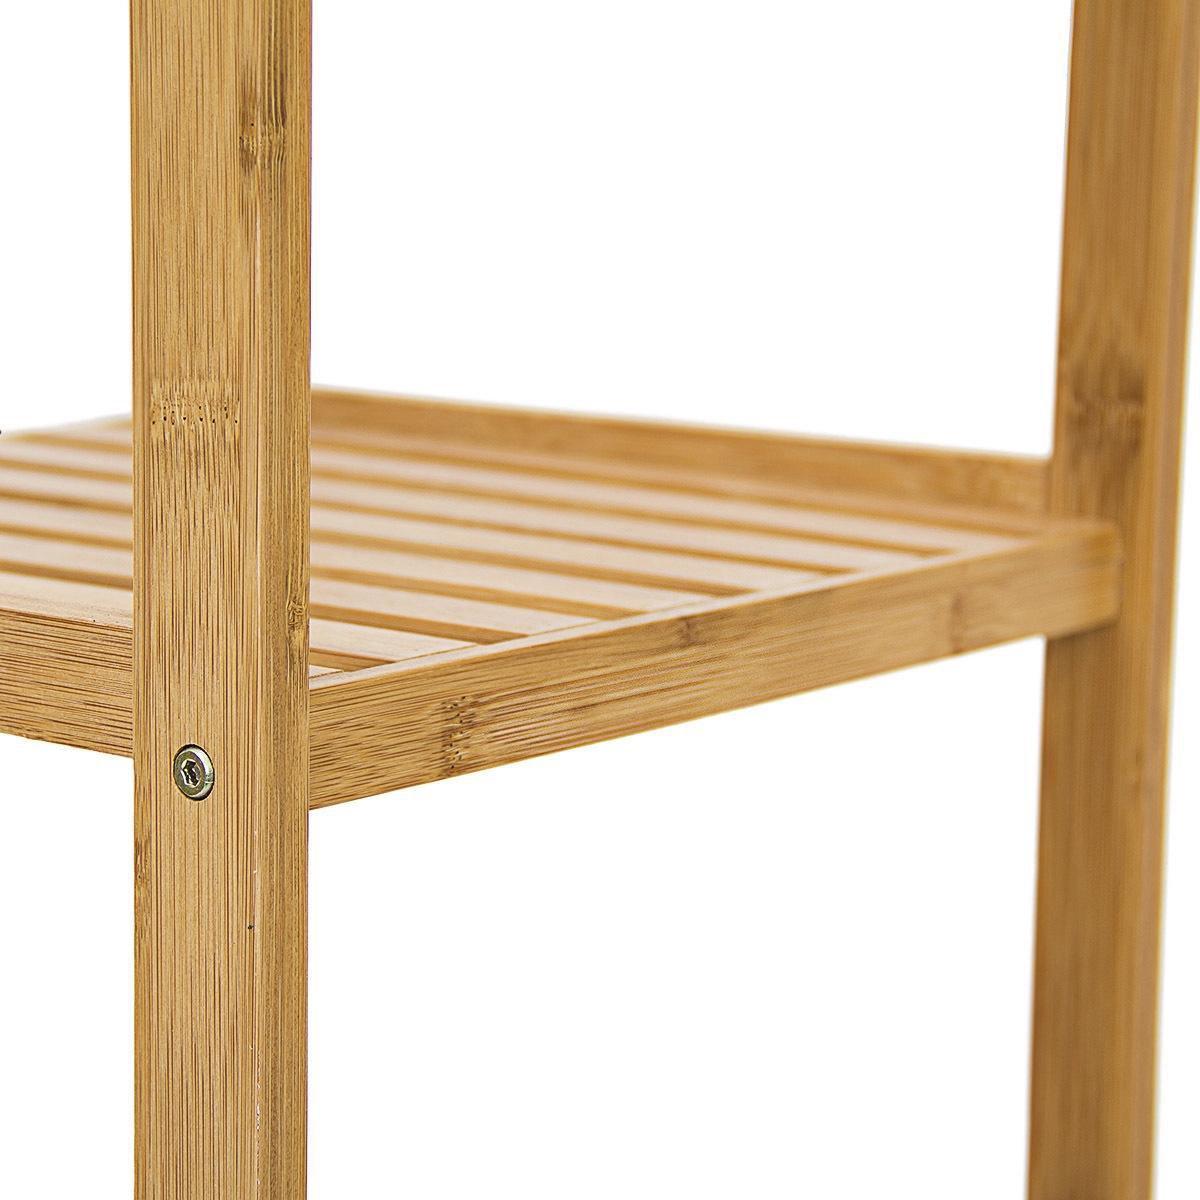 Relaxdays Badkamerkast Bamboe Hout Stellingkast 4 Planken Badkamer Open Kast Meubel Bol Com